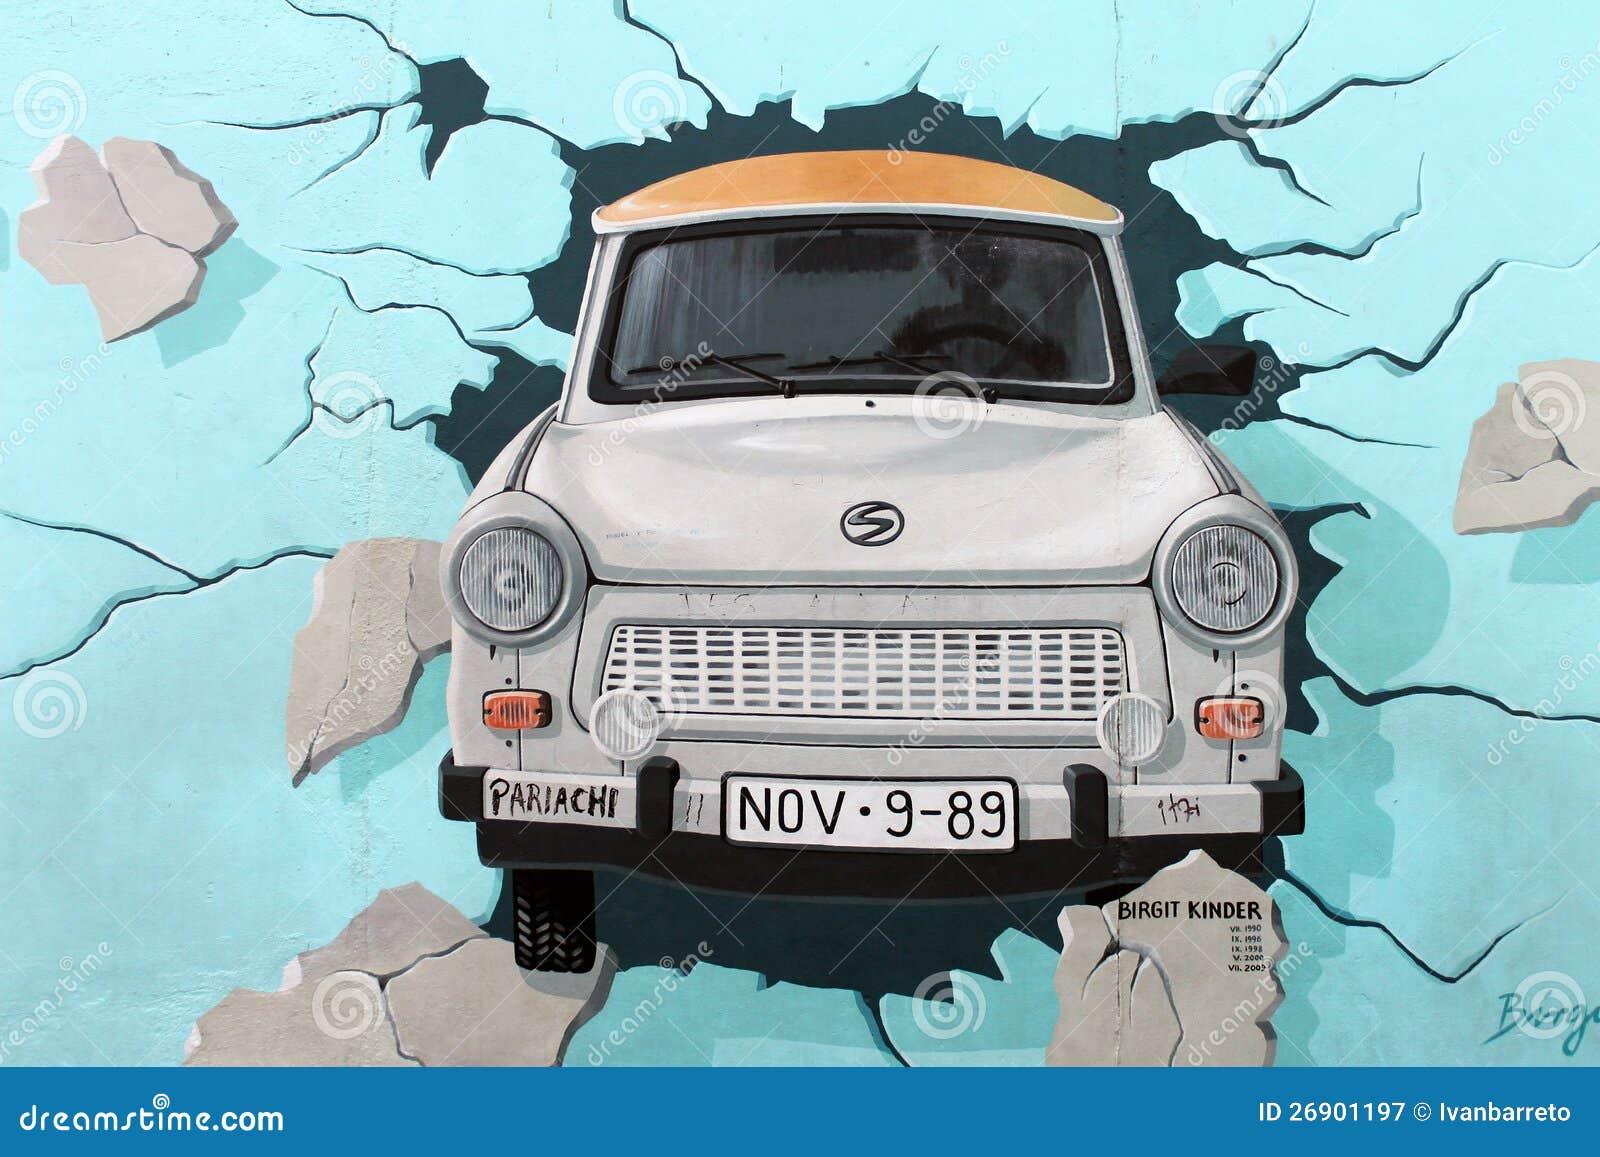 East Side Gallery Berlin Wall Trabant Car Editorial